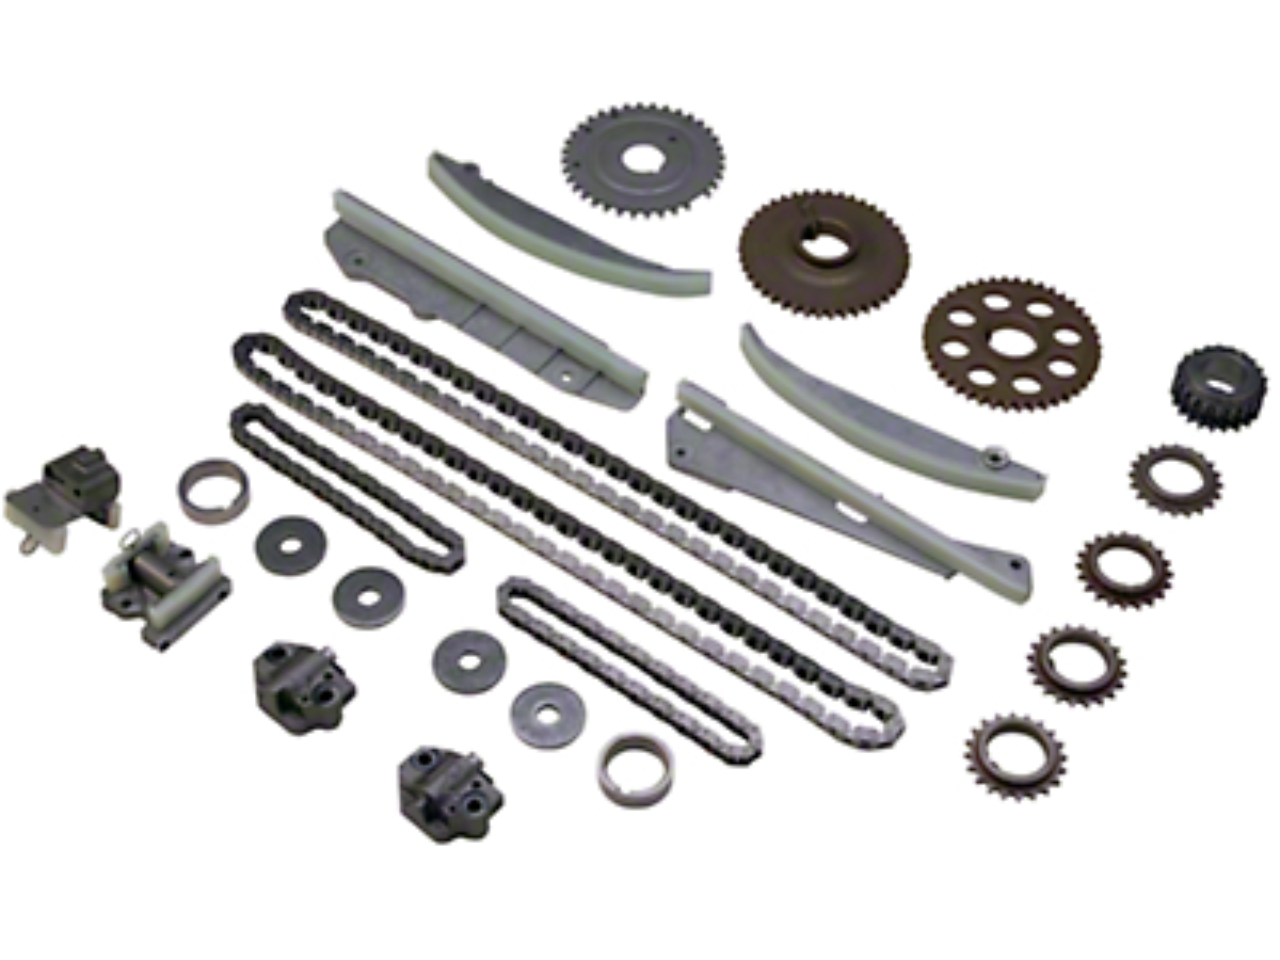 Ford Racing Camshaft Drive Kit - Aluminum Block Applications (96-04 Cobra; 03-04 Mach 1)